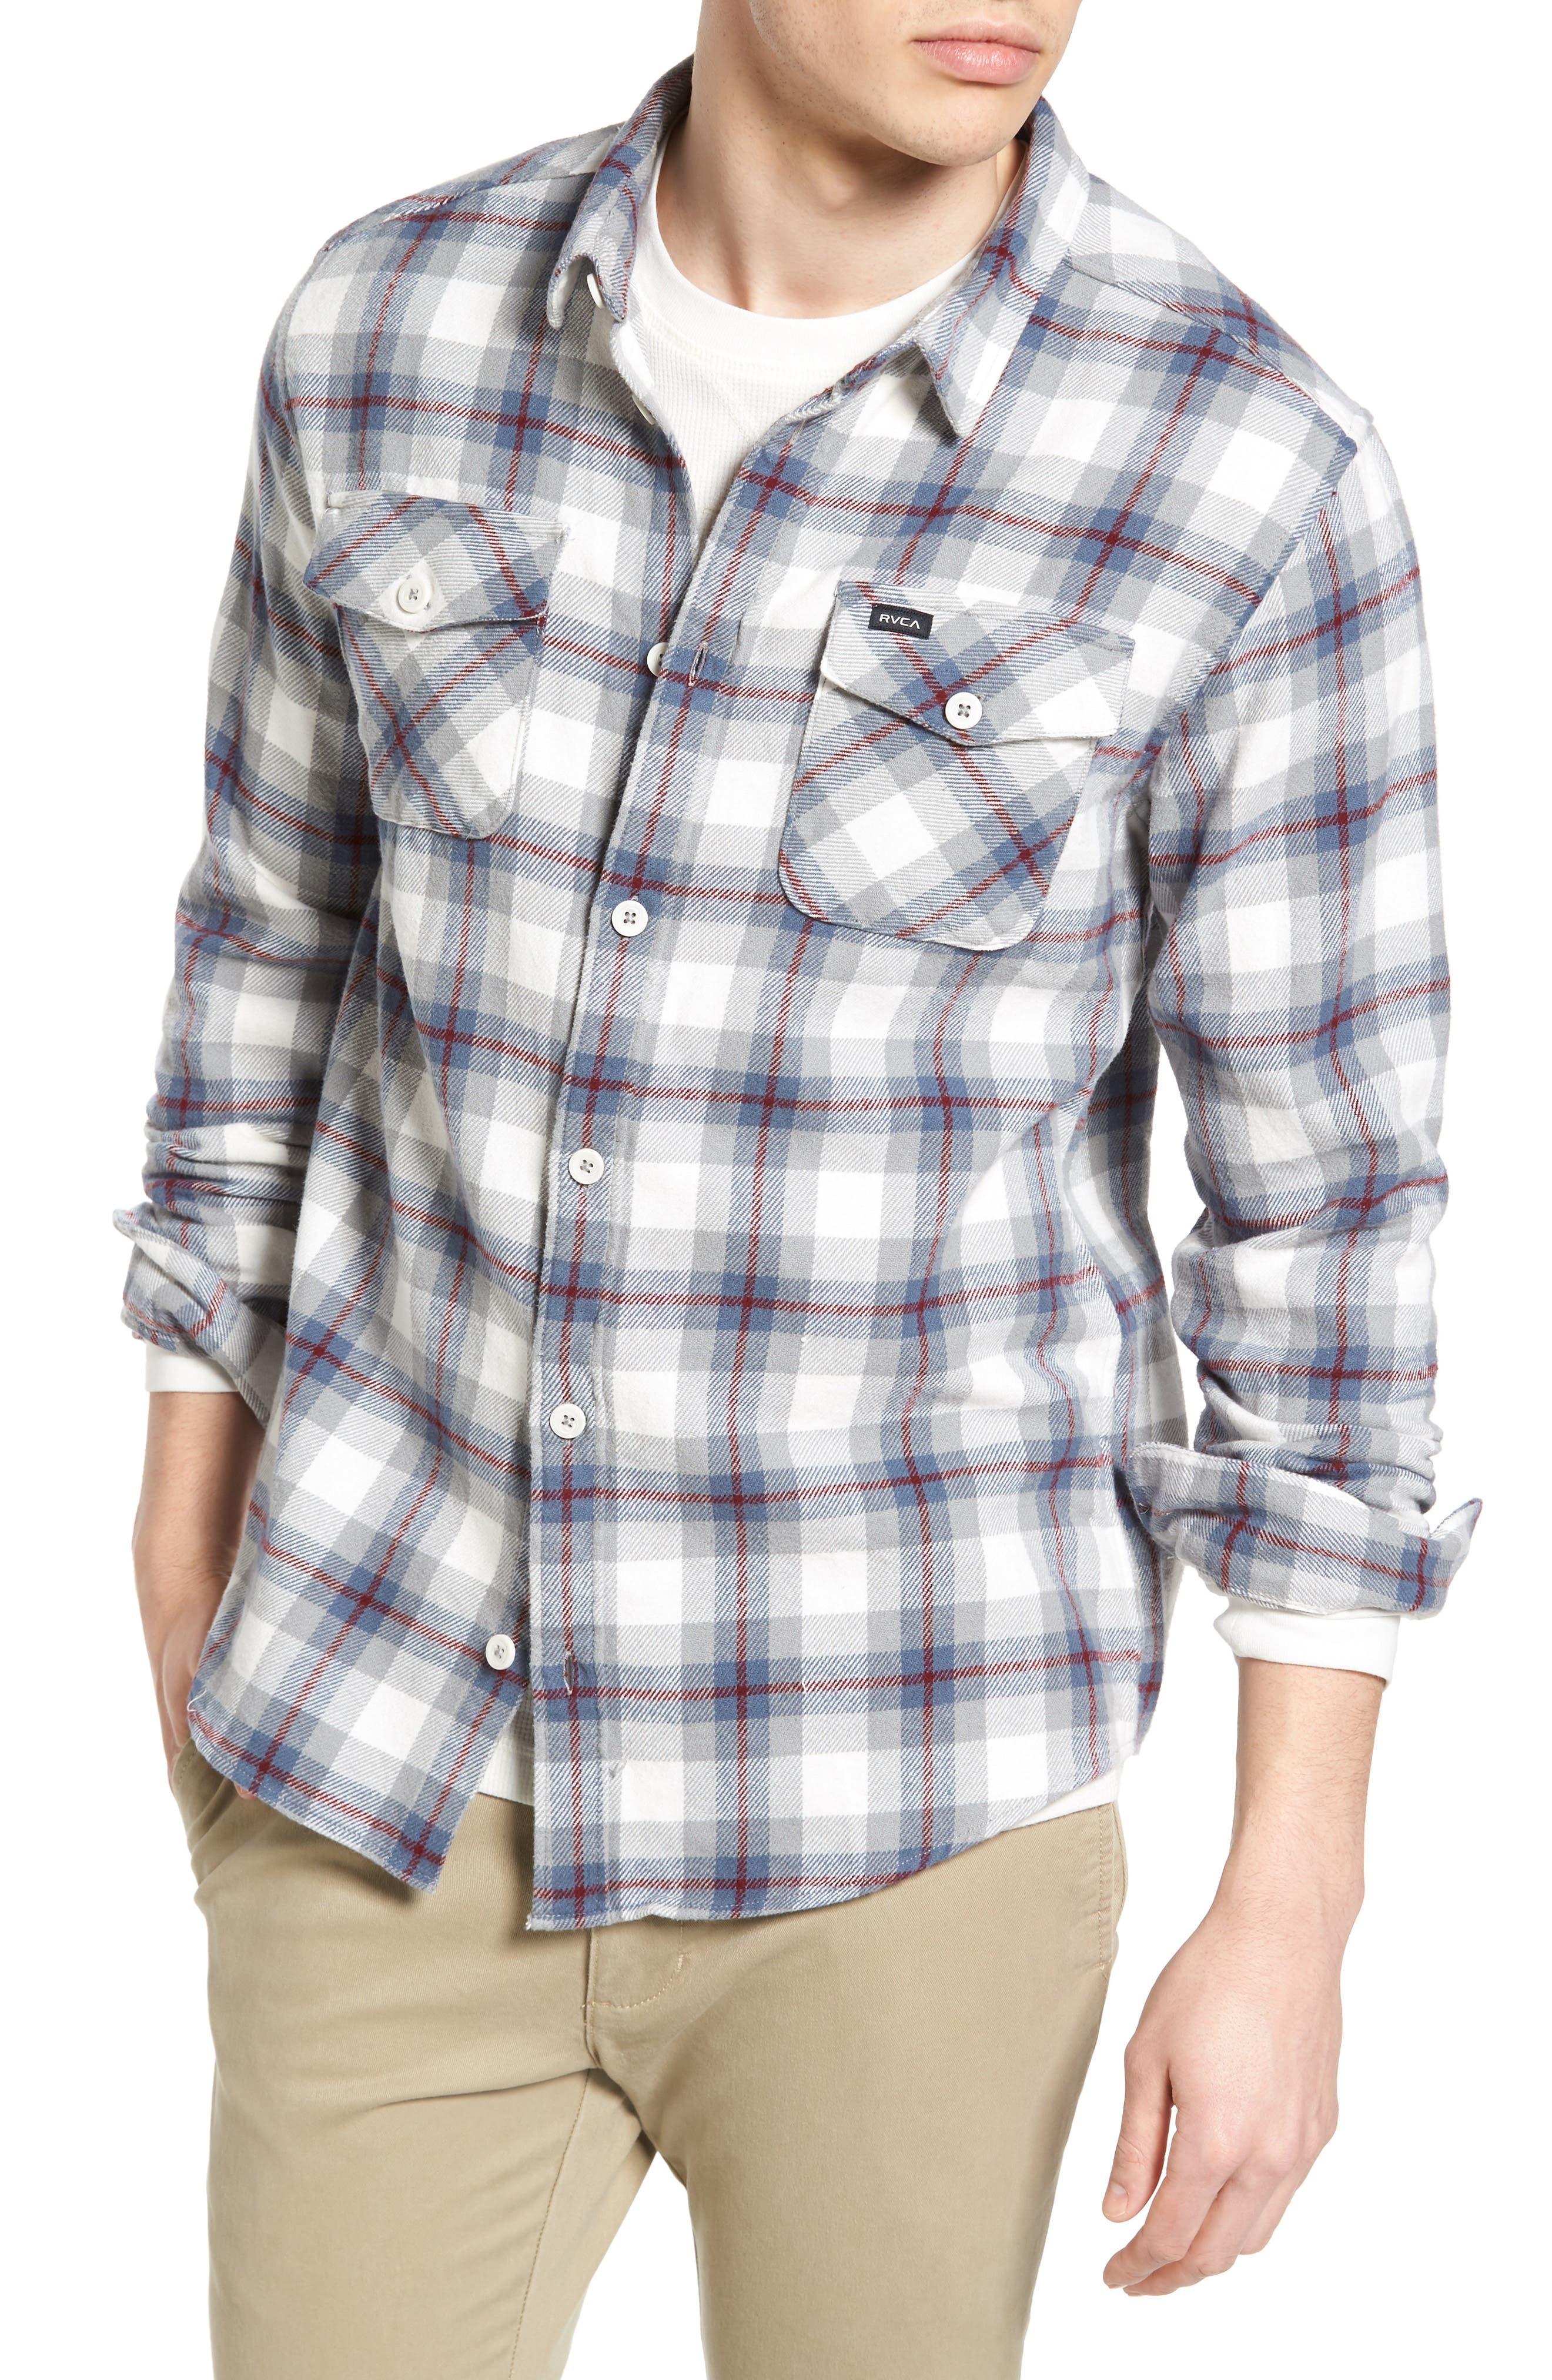 'That'll Work' Trim Fit Plaid Flannel Shirt,                             Main thumbnail 3, color,